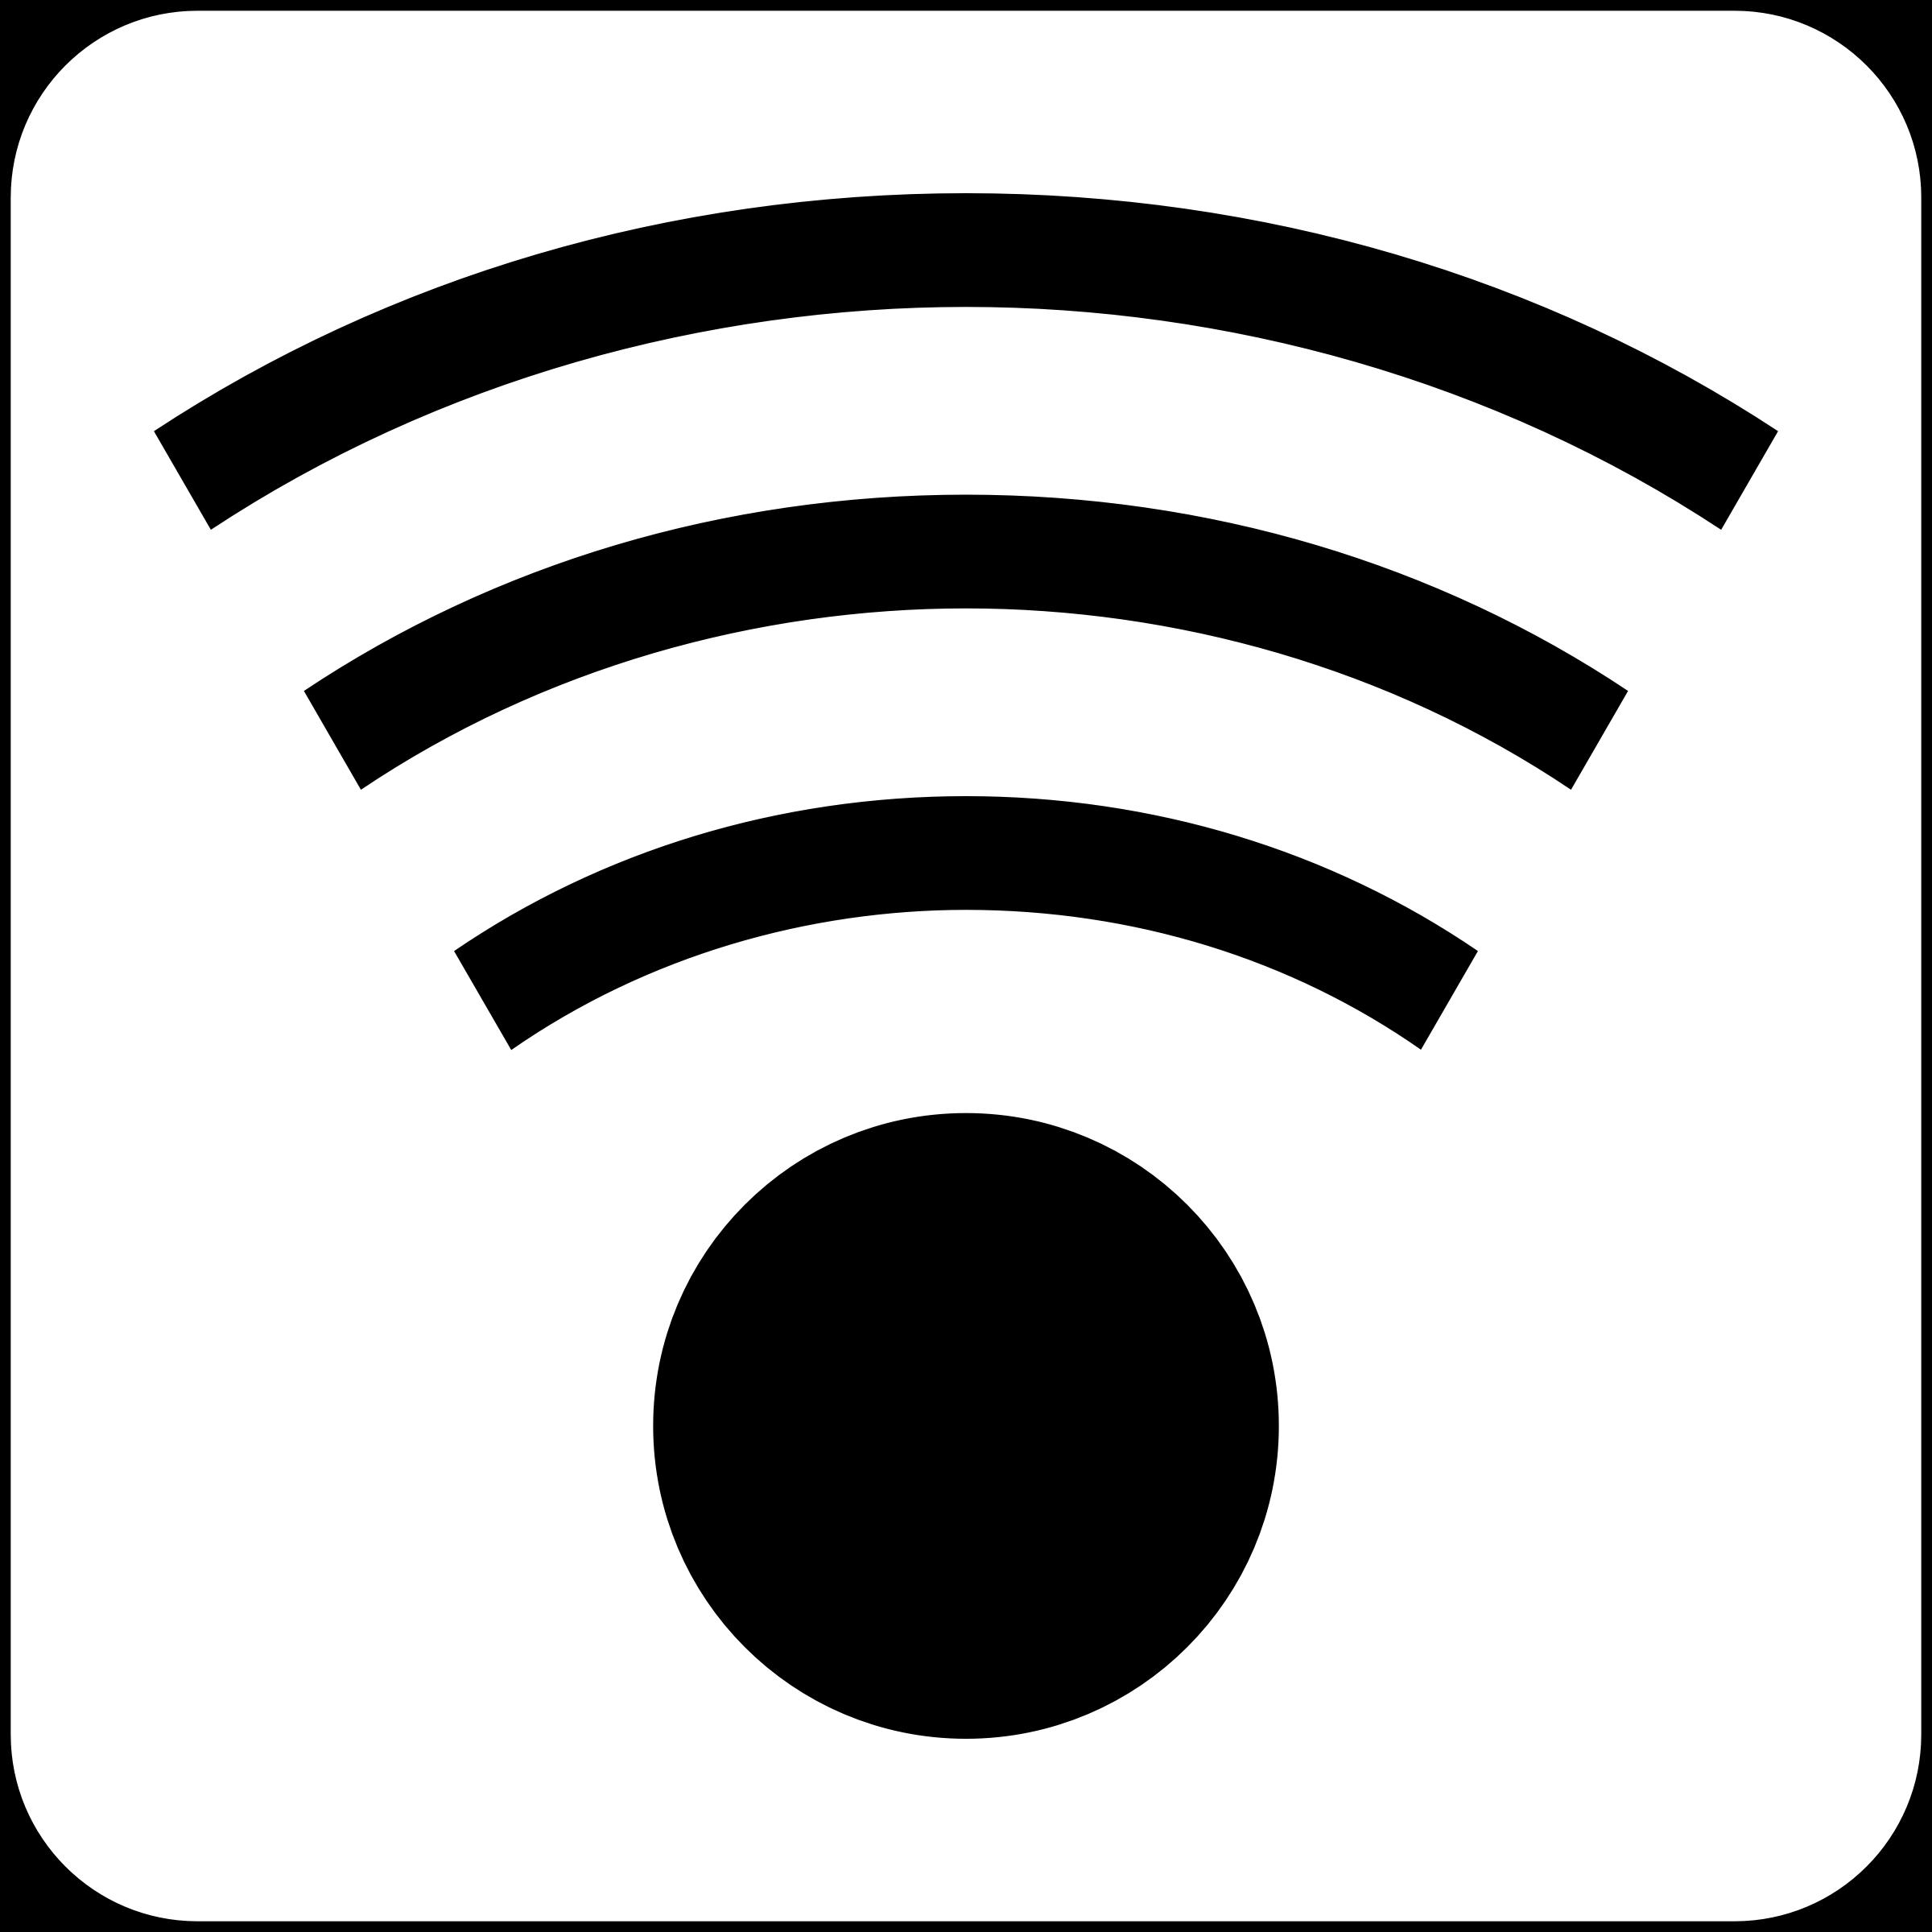 2400x2400 Command Symbol Mac Choice Image